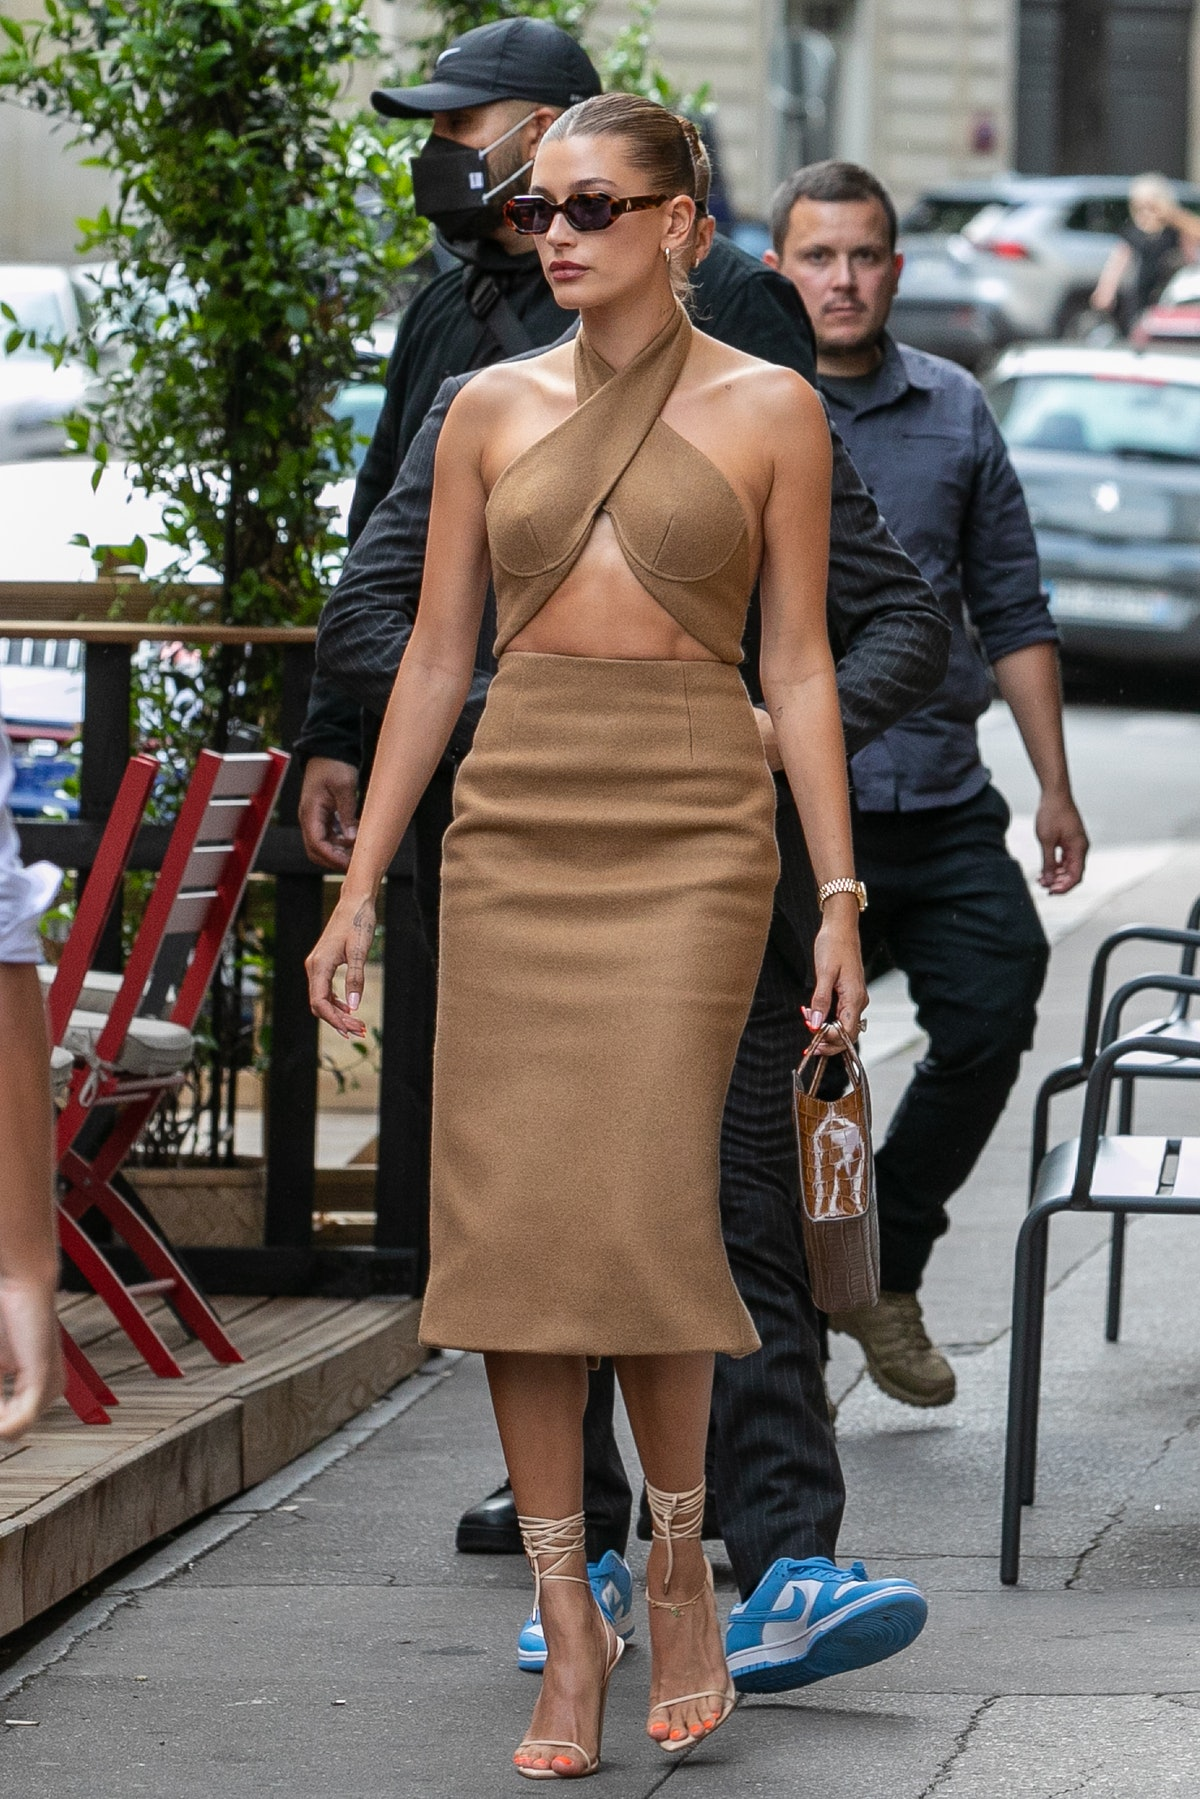 Hailey Bieber is seen leaving the 'Dinand by Ferdi' restaurant in Paris, France in June 2021.